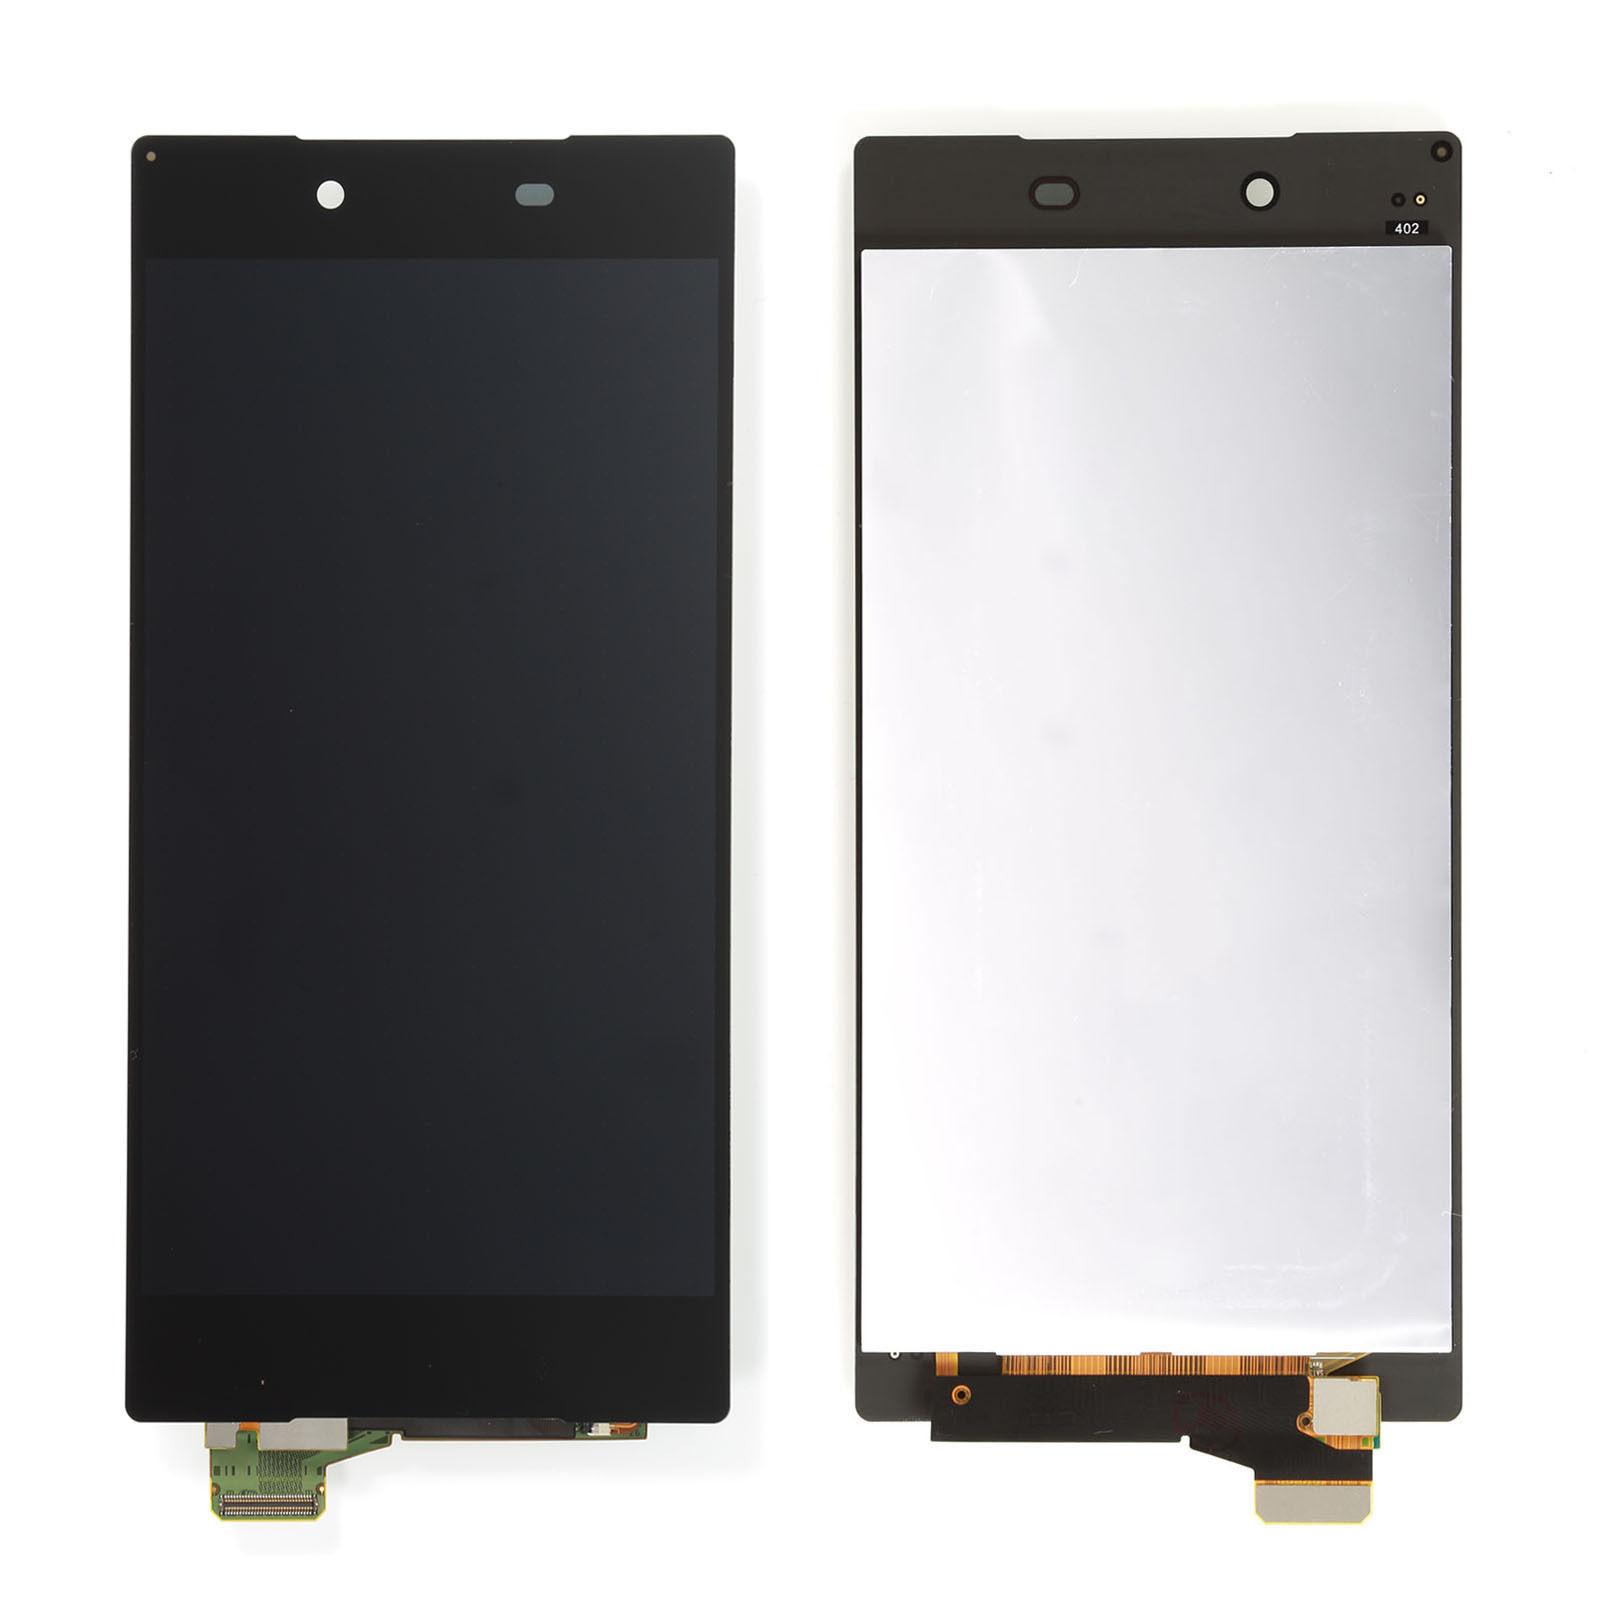 Digitizer - dotykové sklo (plocha) včetně LCD displeje pro Sony Xperia Z5 Premium - bílý